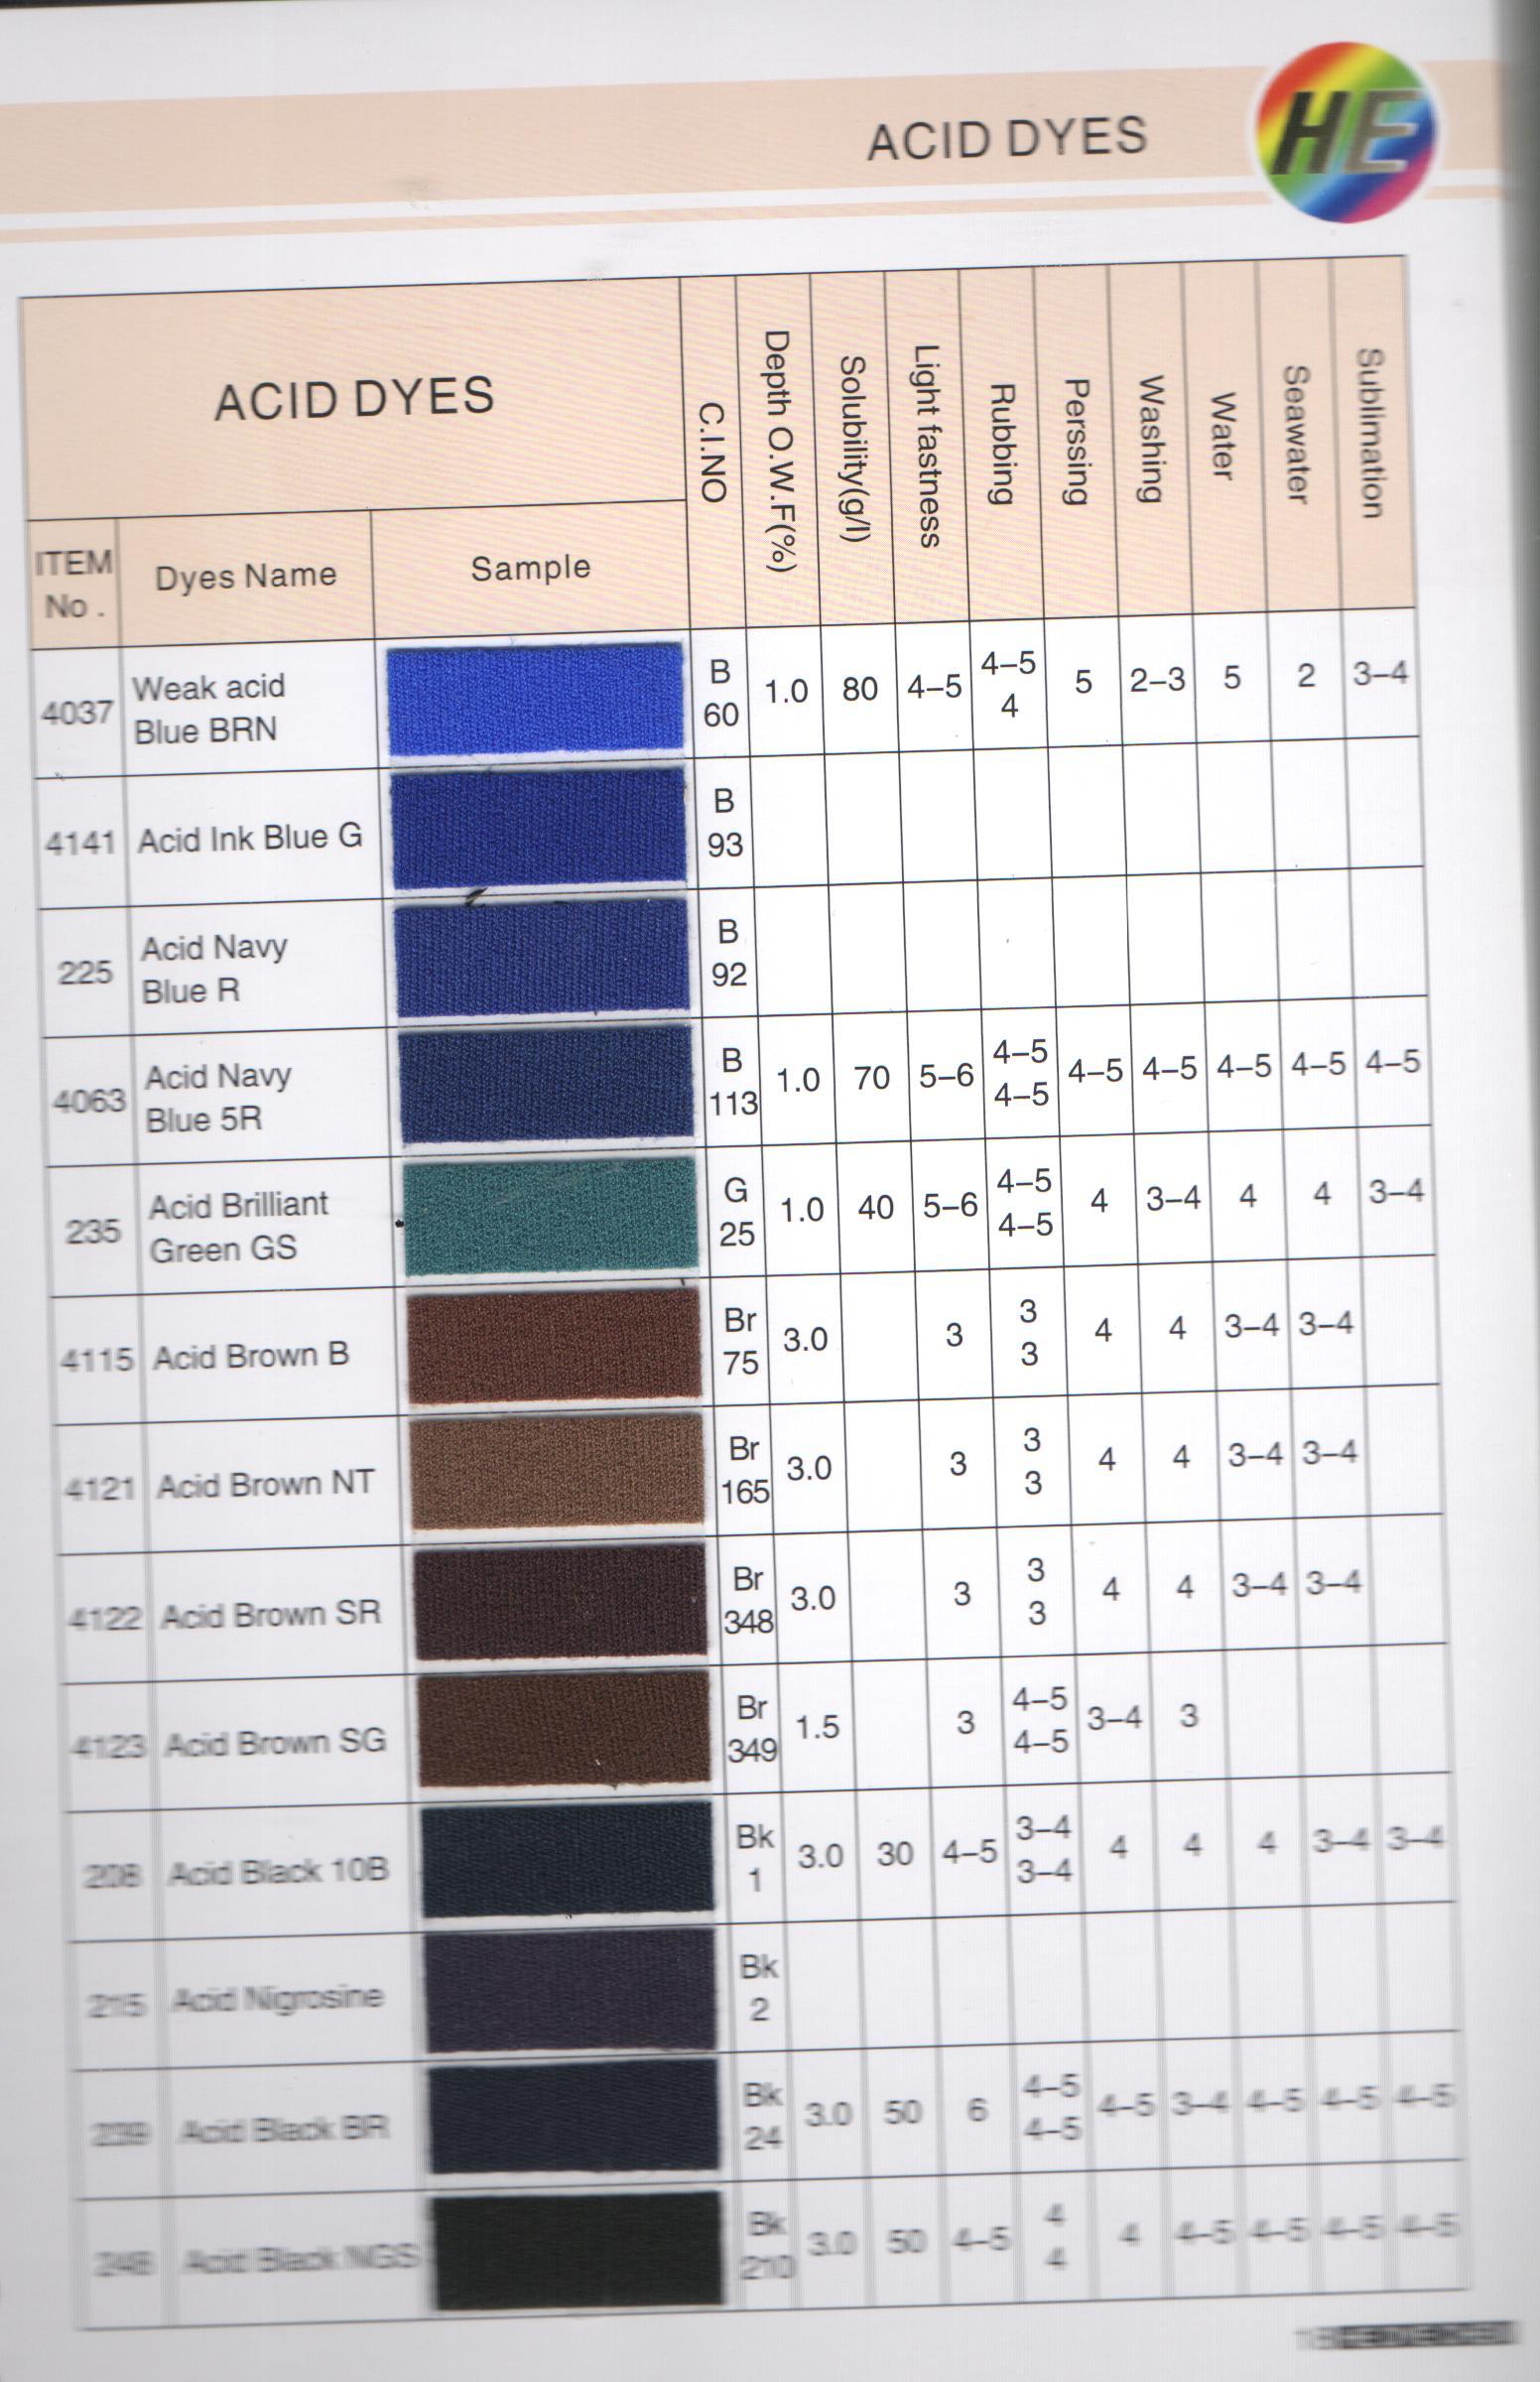 ACID રંગોનો 03